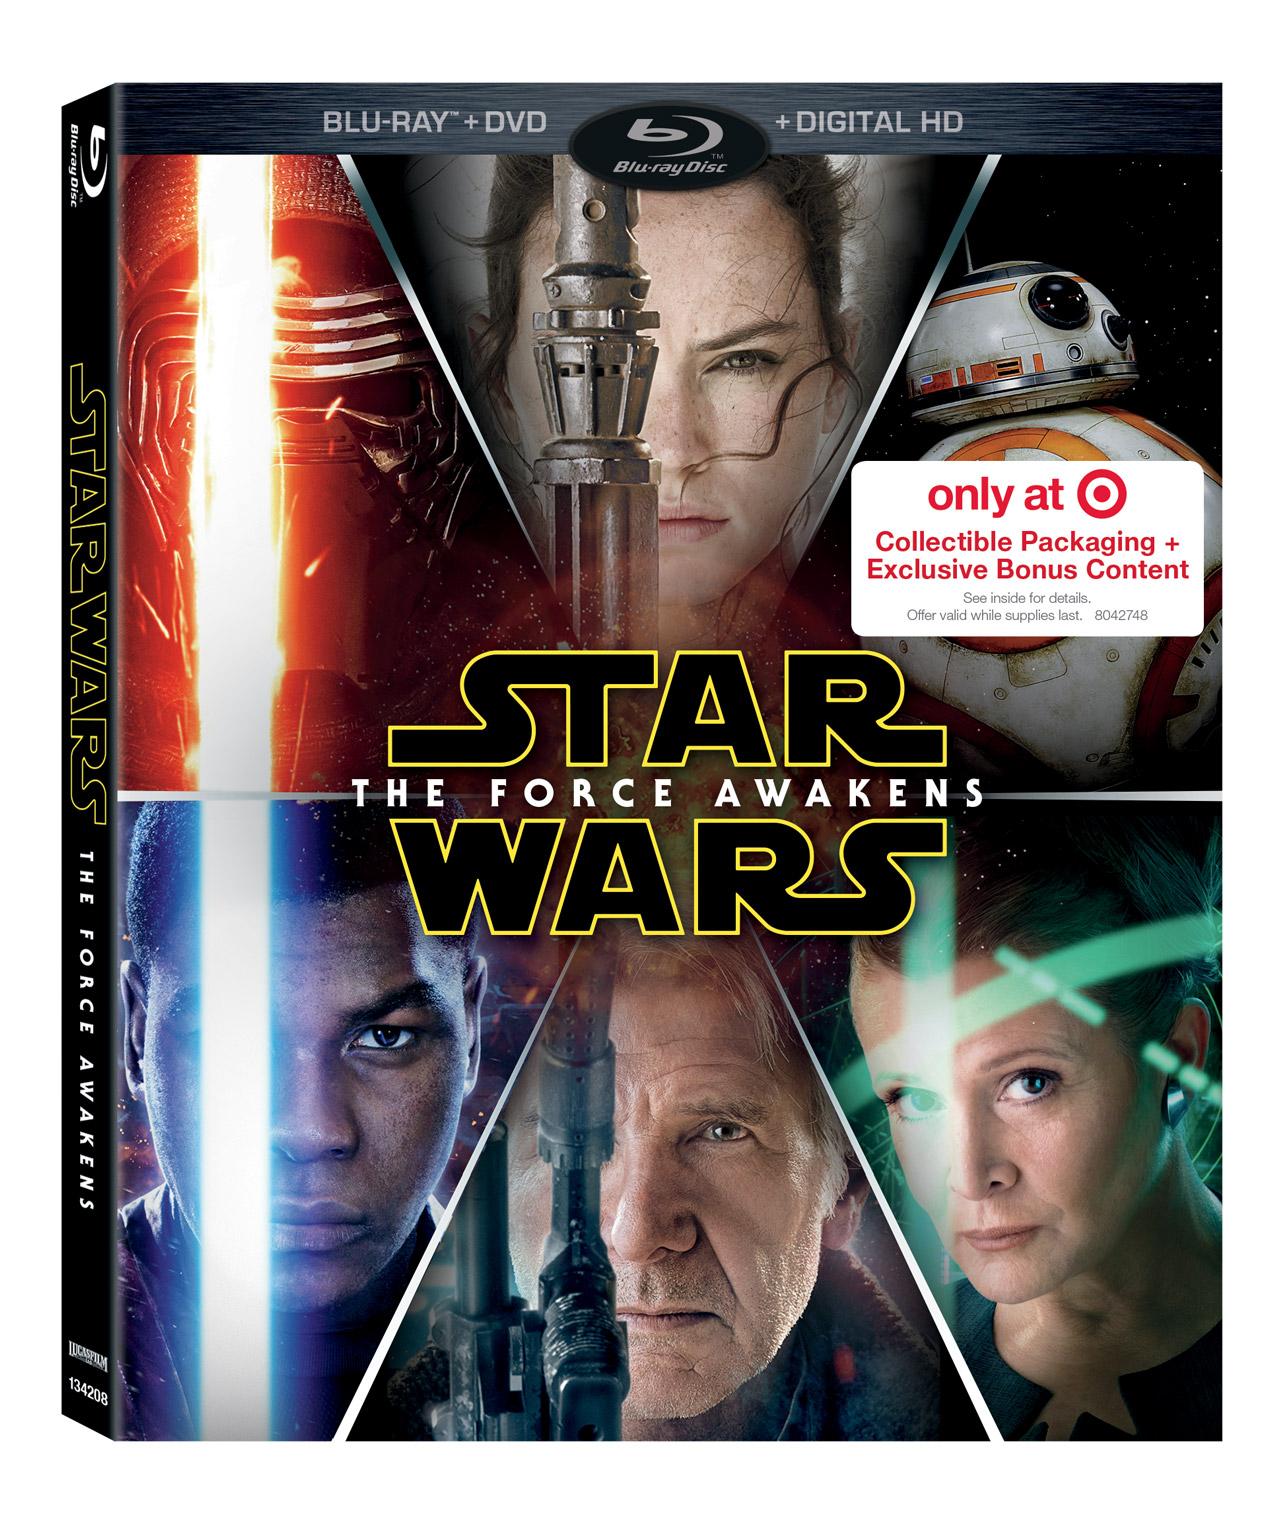 Star Wars 7 Blu Ray Release